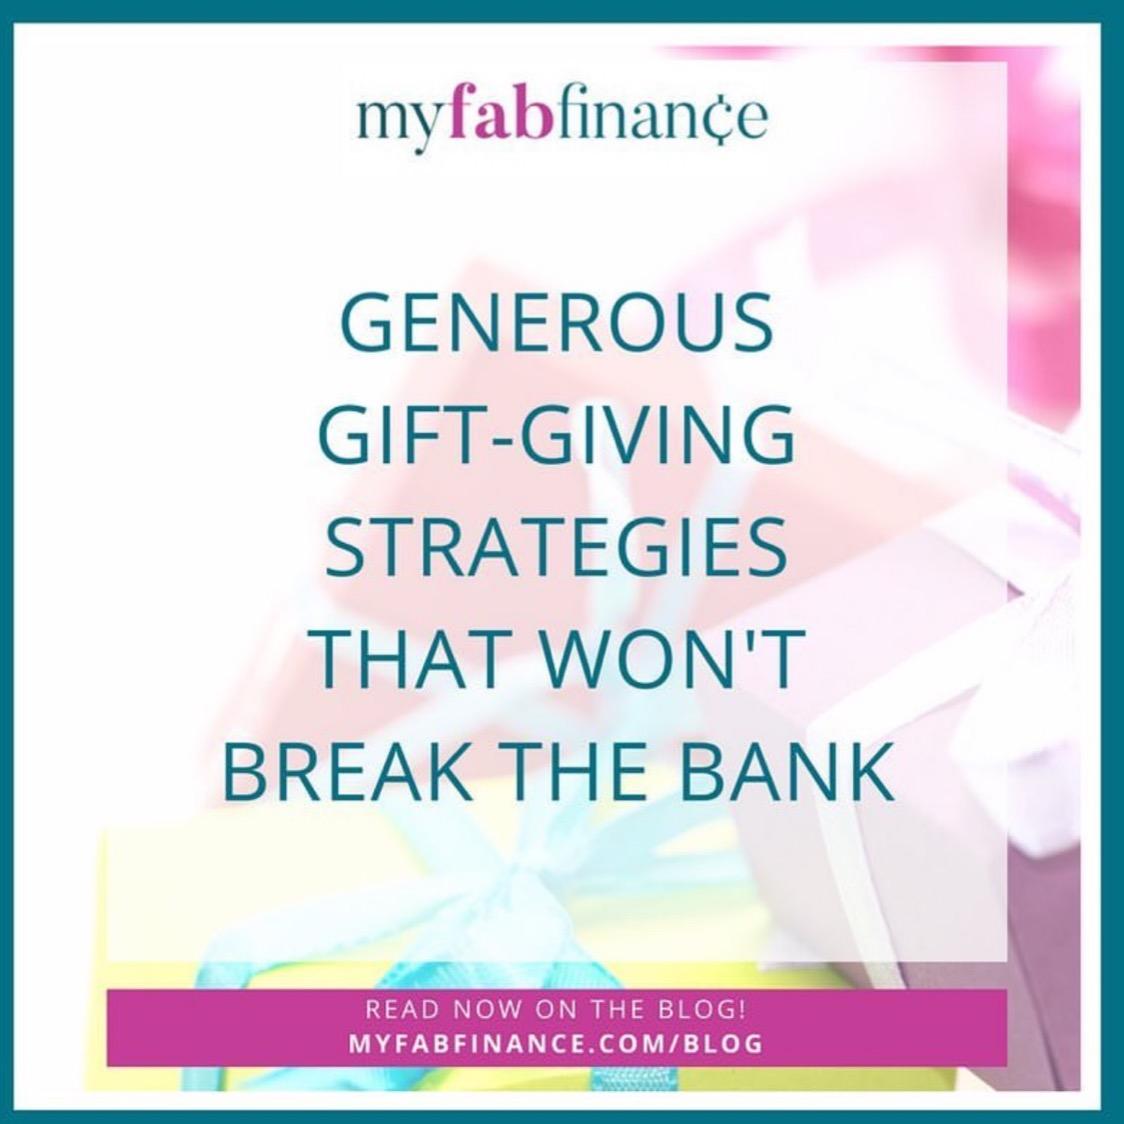 10 Generous Gift-Giving Strategies That Won't Break The Bank